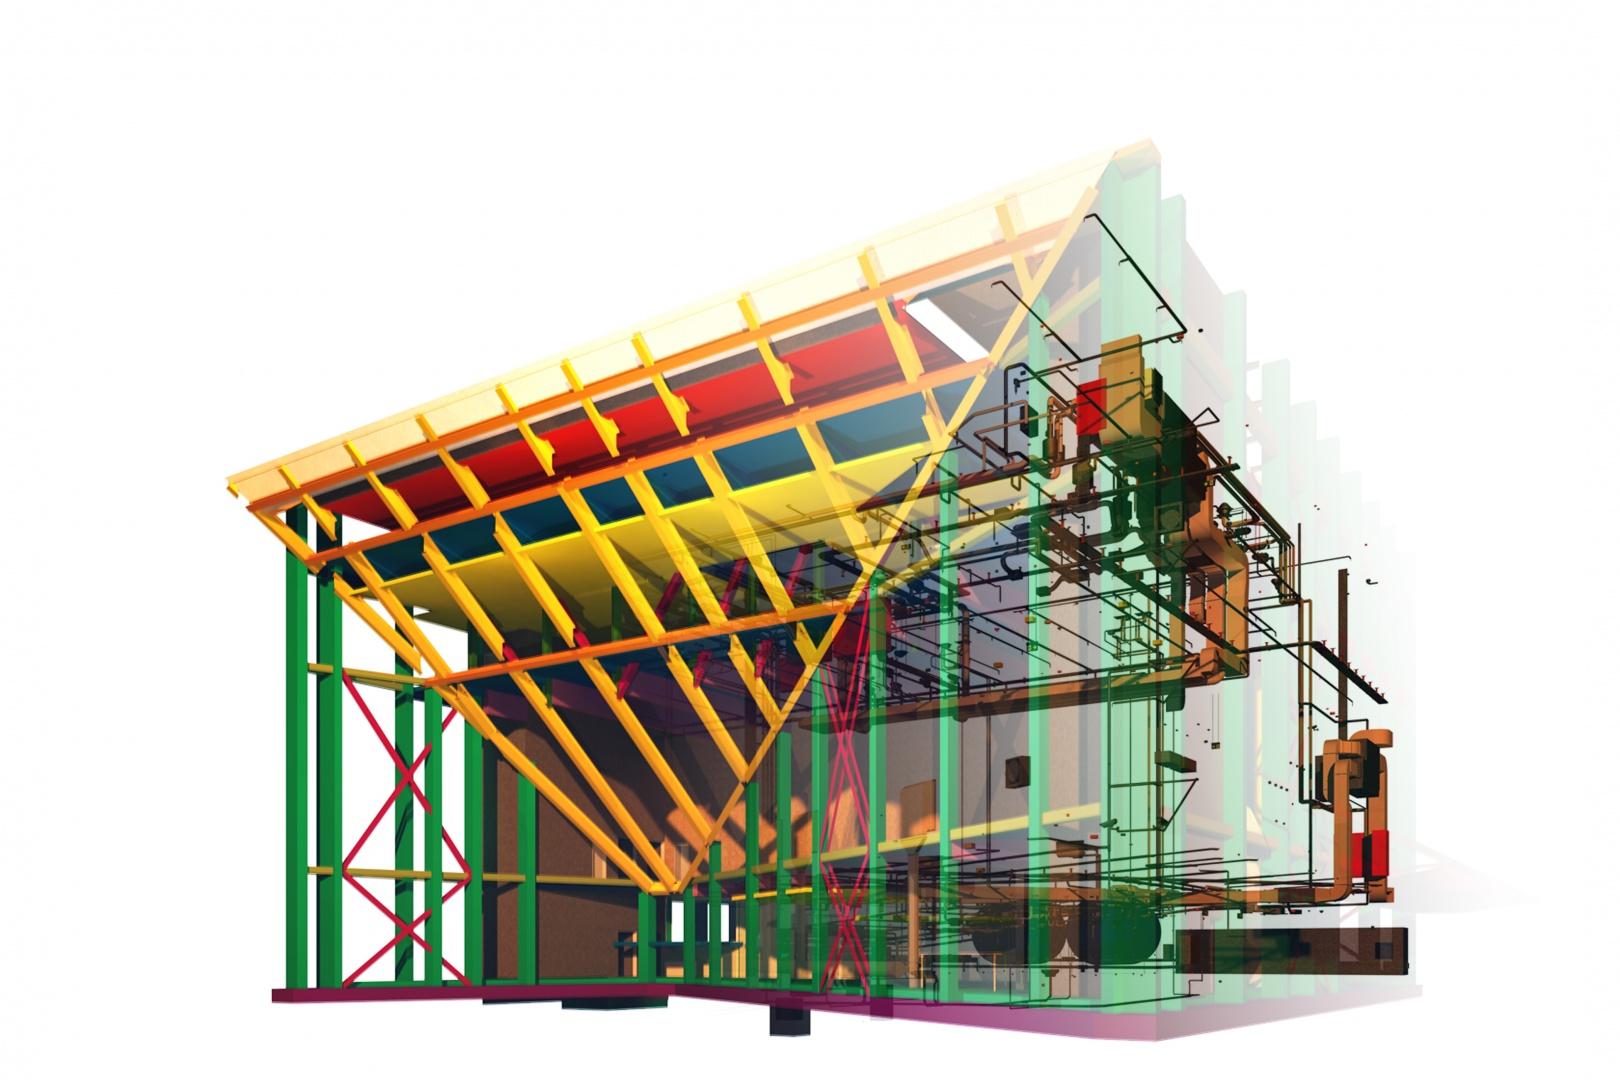 Tragwerk- und Haustechnikmodell © OOS AG